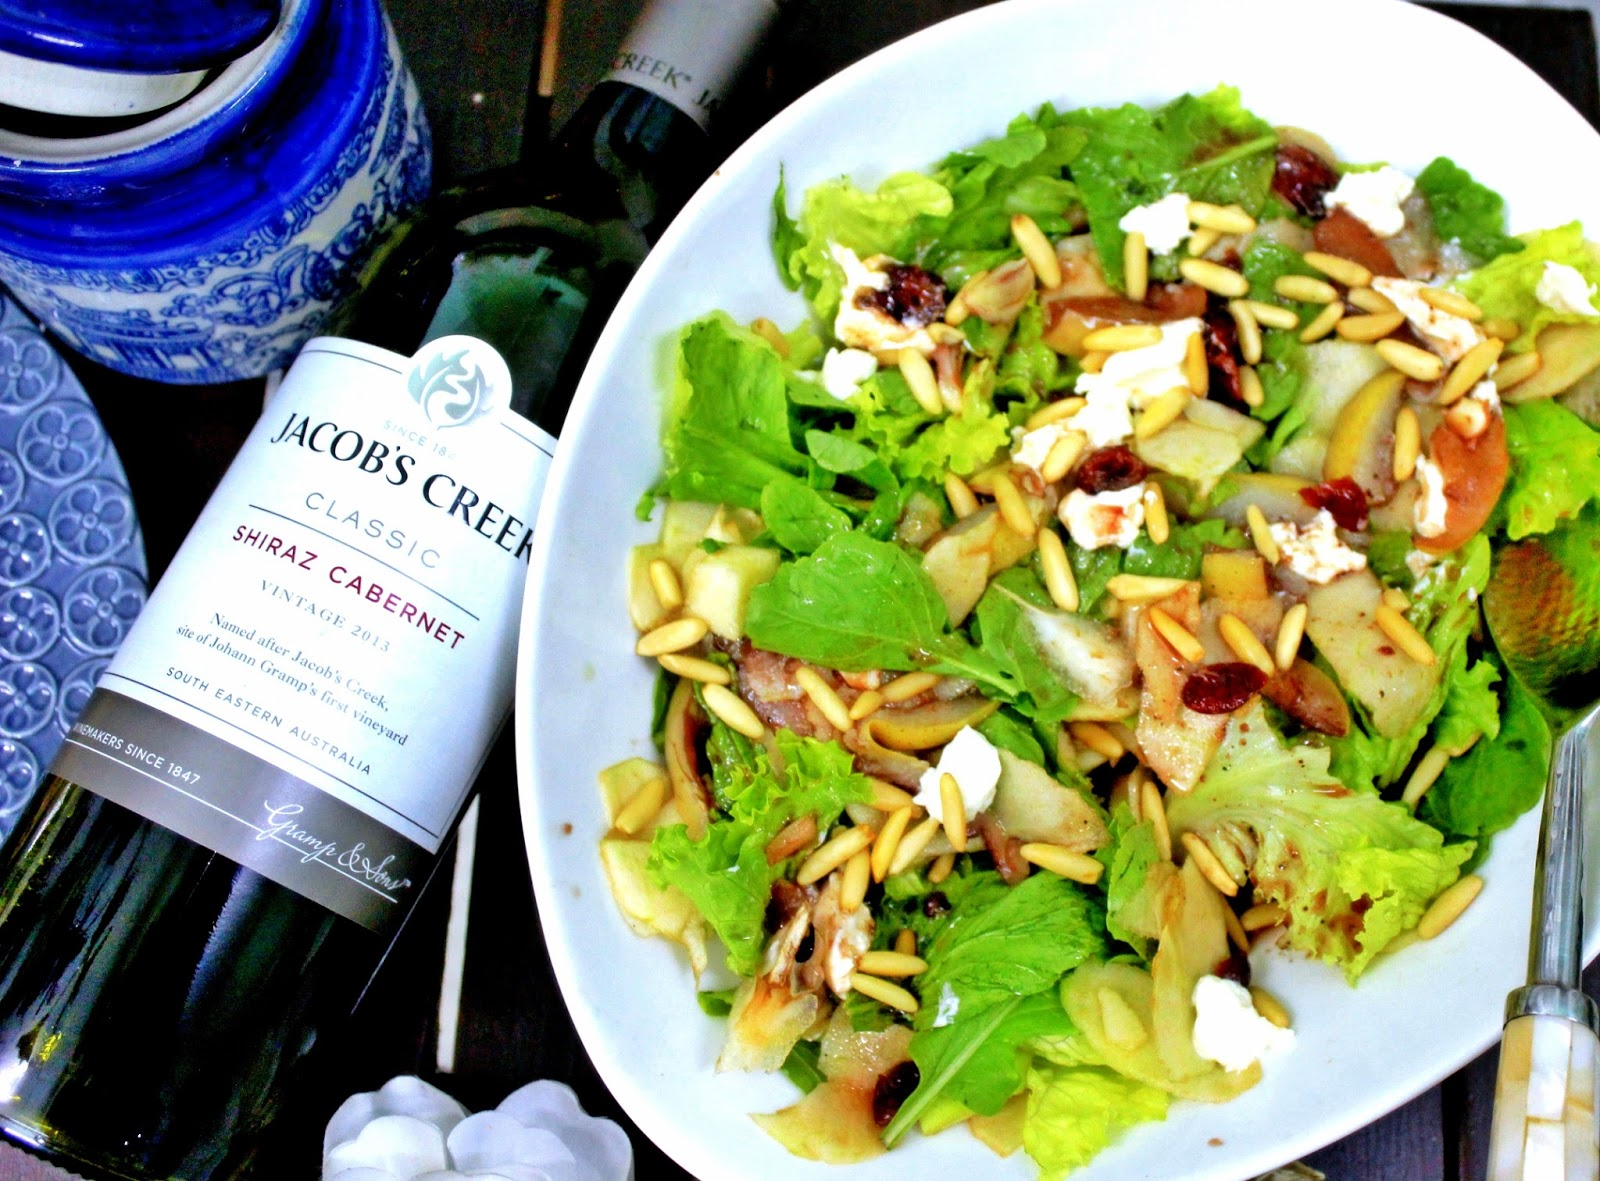 Pear and Apple salad recipe